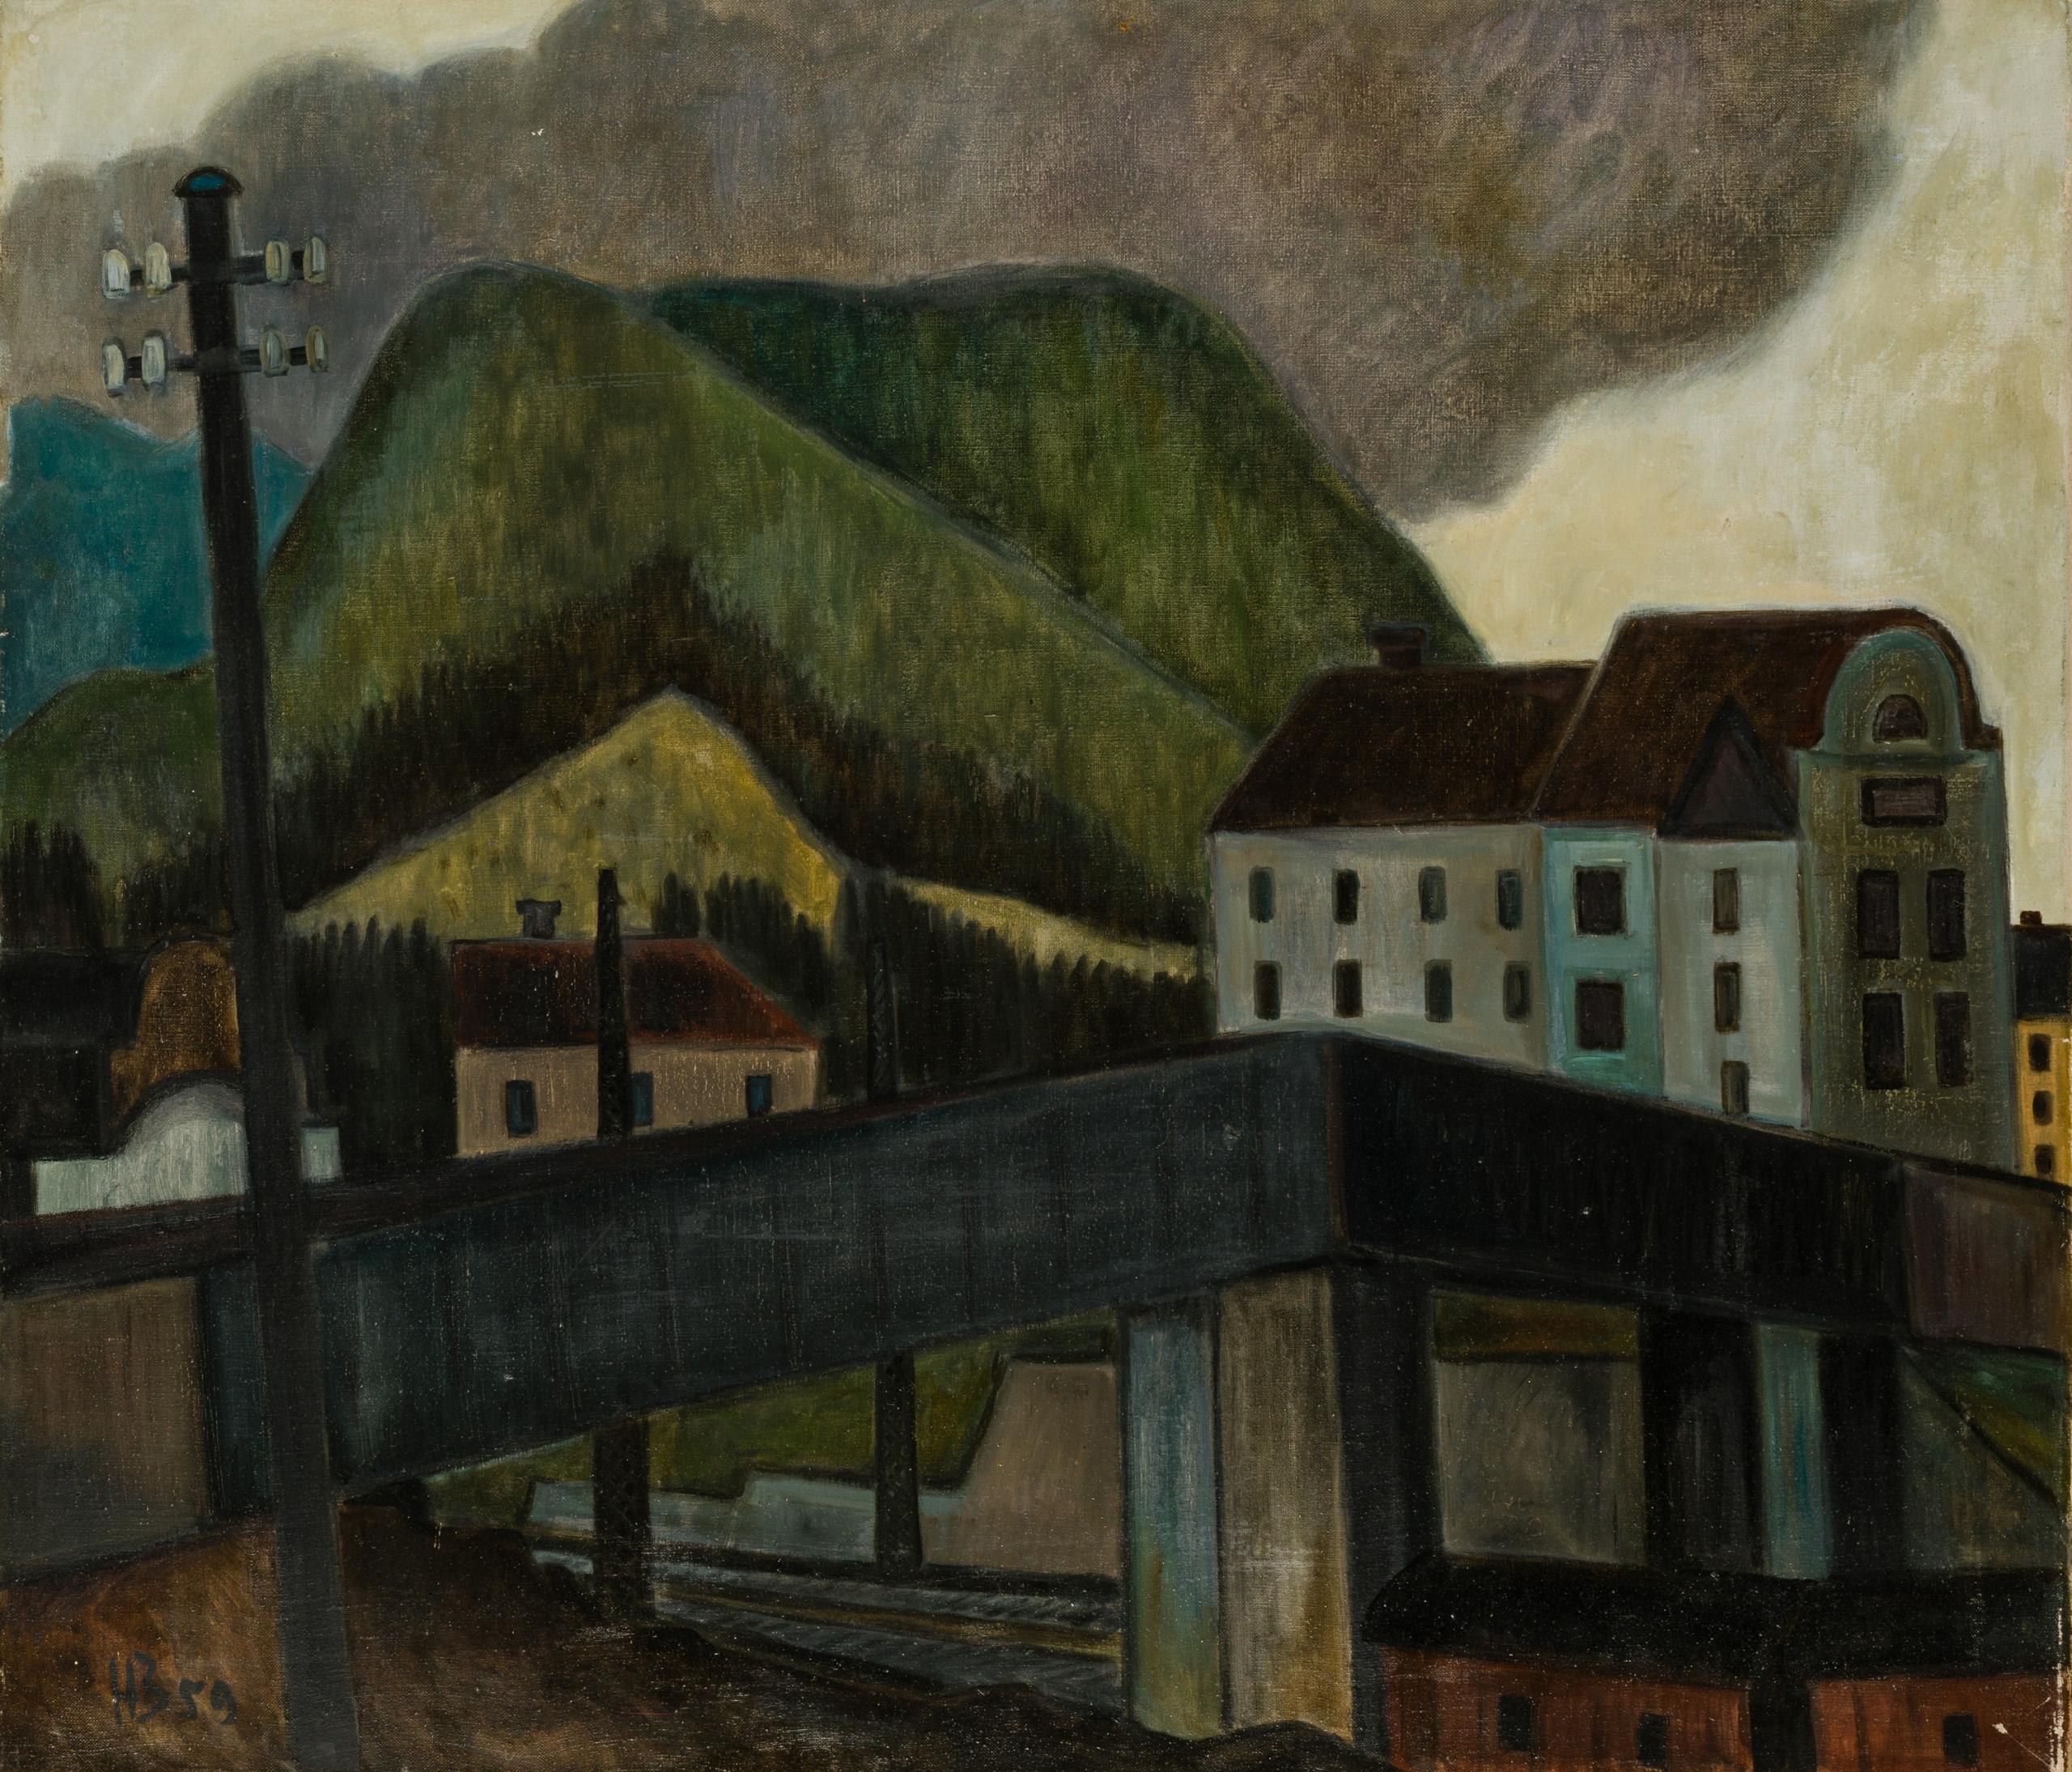 Herbert Breiter, Salzburg-Gnigl